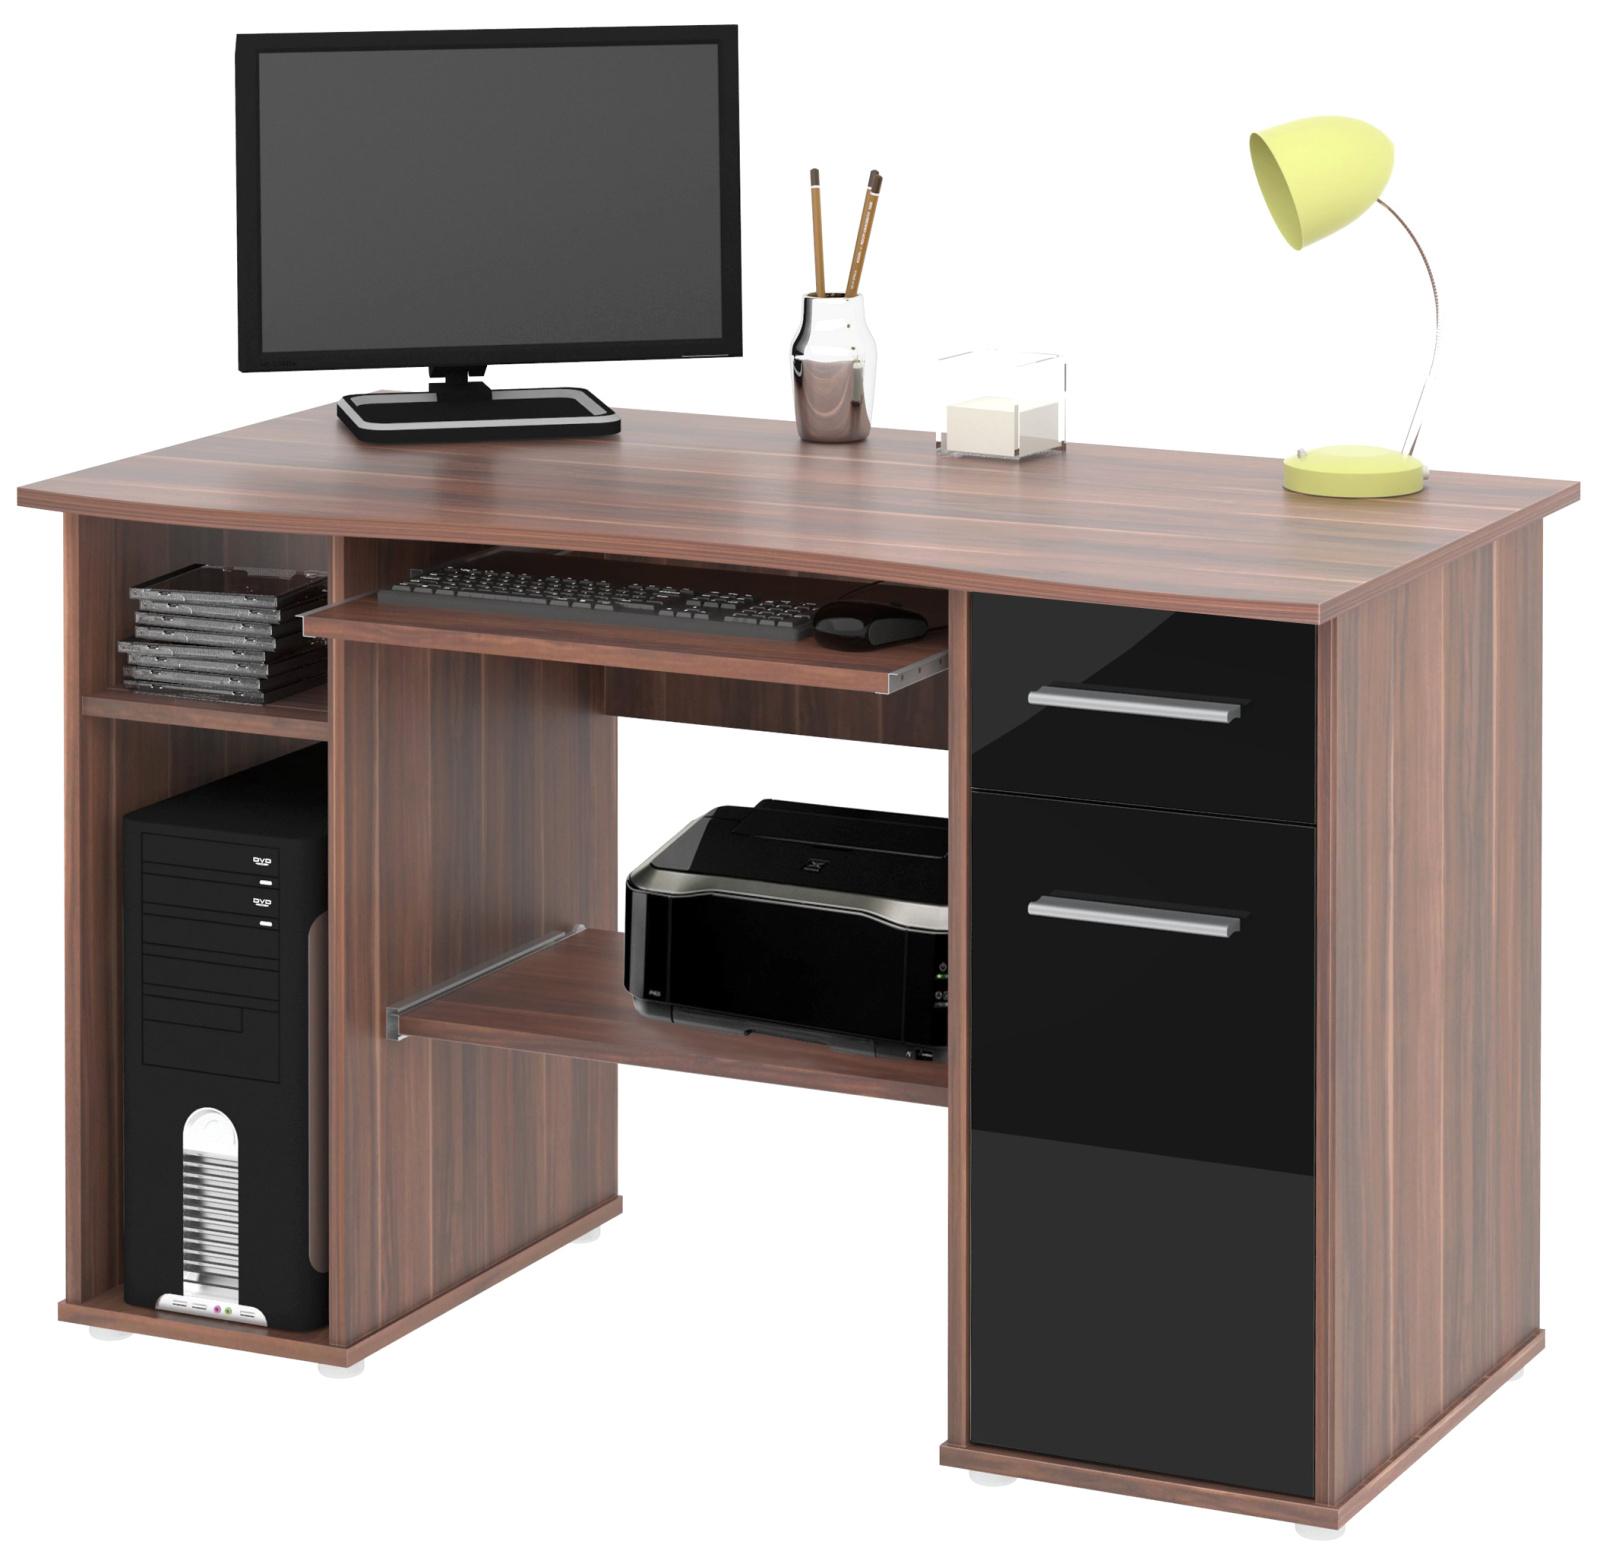 PC stůl SAMUEL švestka/černá HGS MB Samuel-švestka/černá HGS